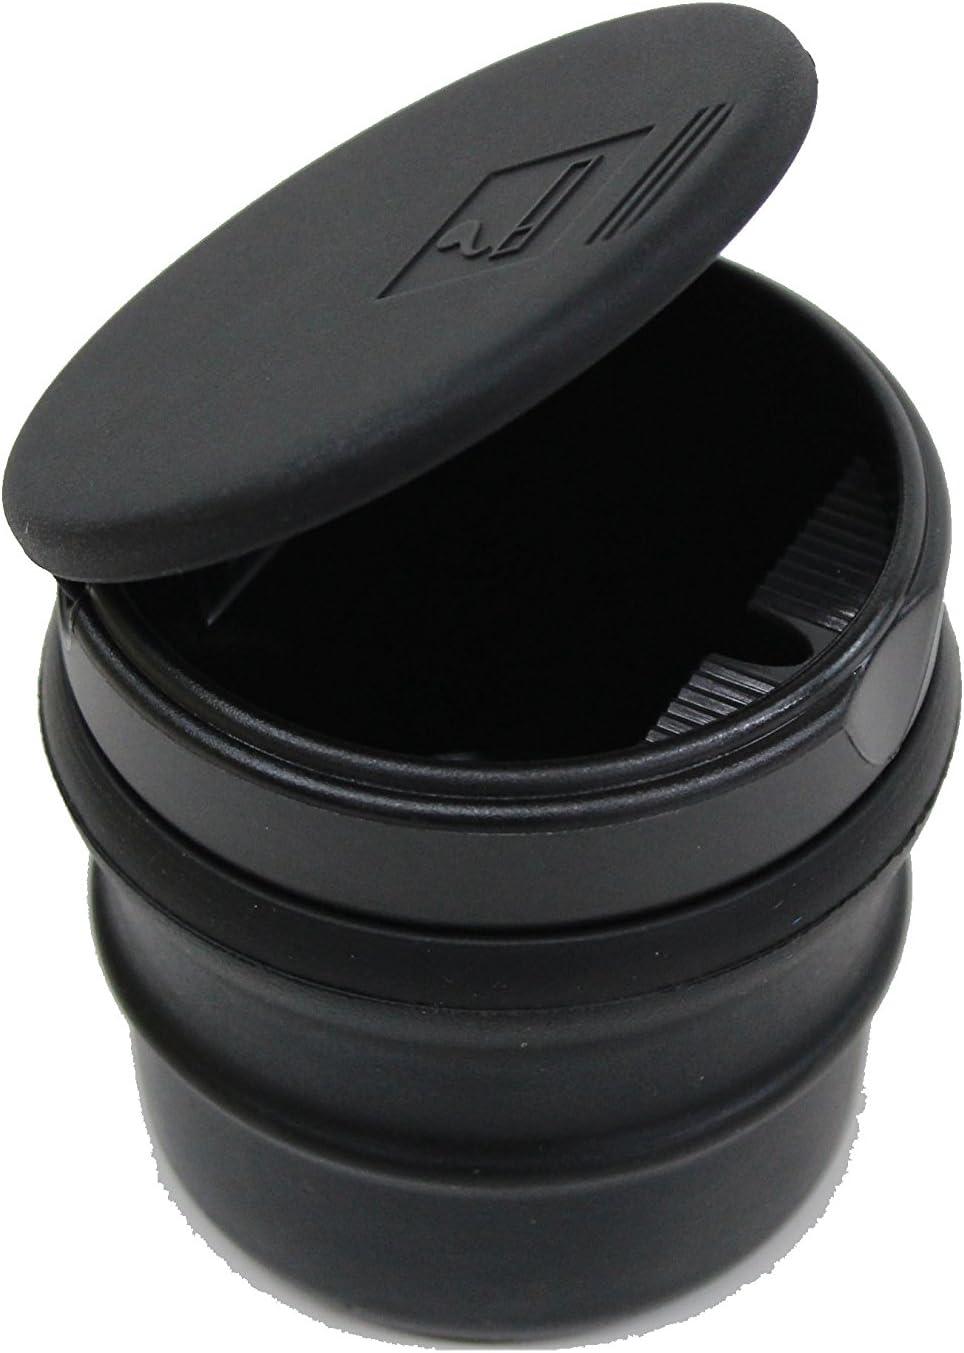 XL500S 79-81 All Balls 55-108 Fork Seal Kit for Honda XL350 74-78